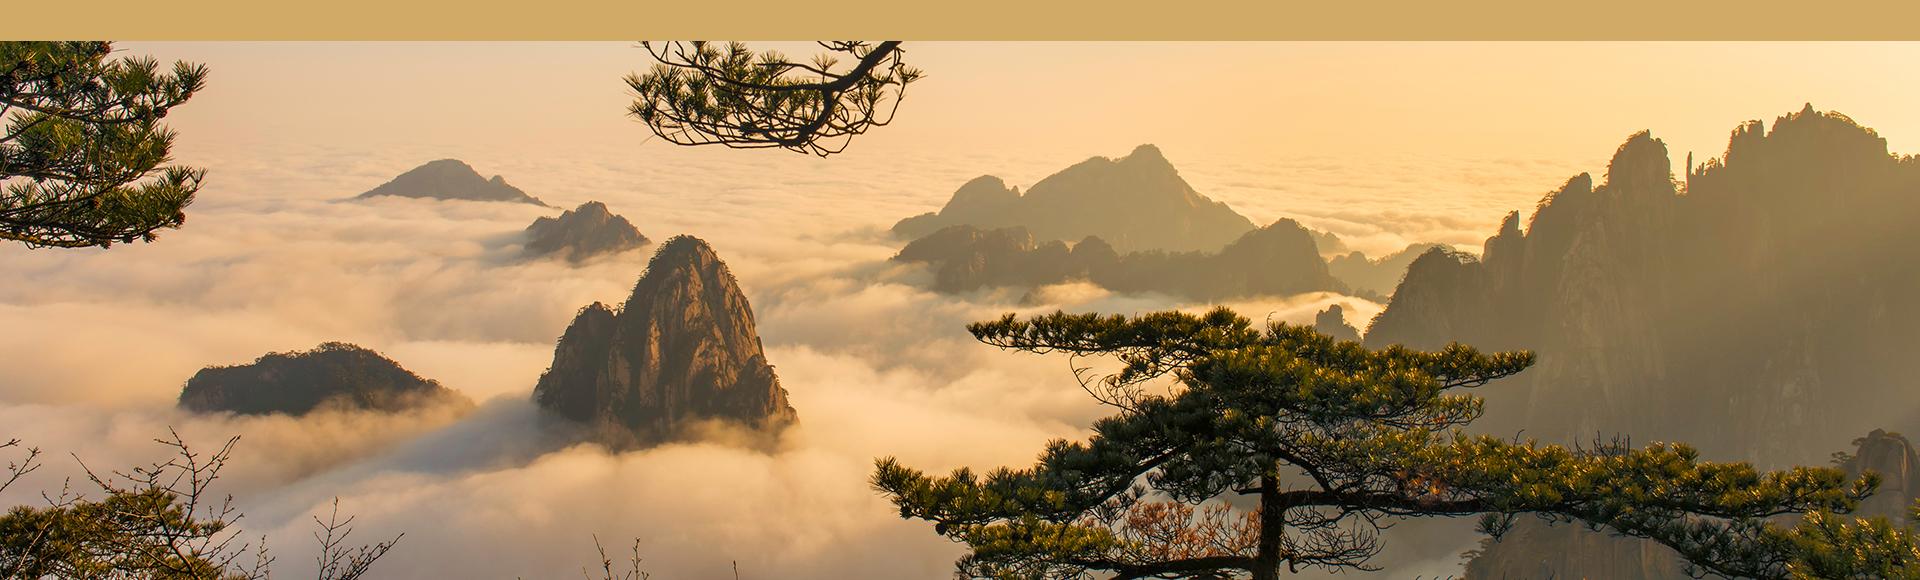 te amarillo Huo Shan Huang Ya provincia Anhui China